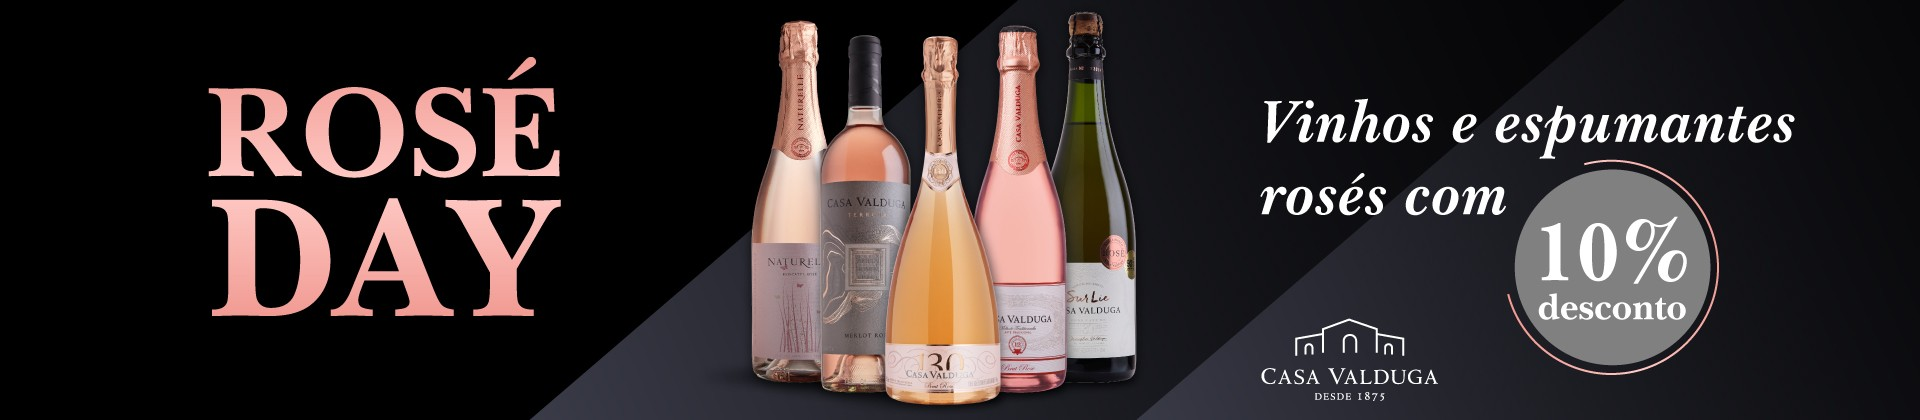 Campanha Rosé Day Famiglia Valduga (1940x420)